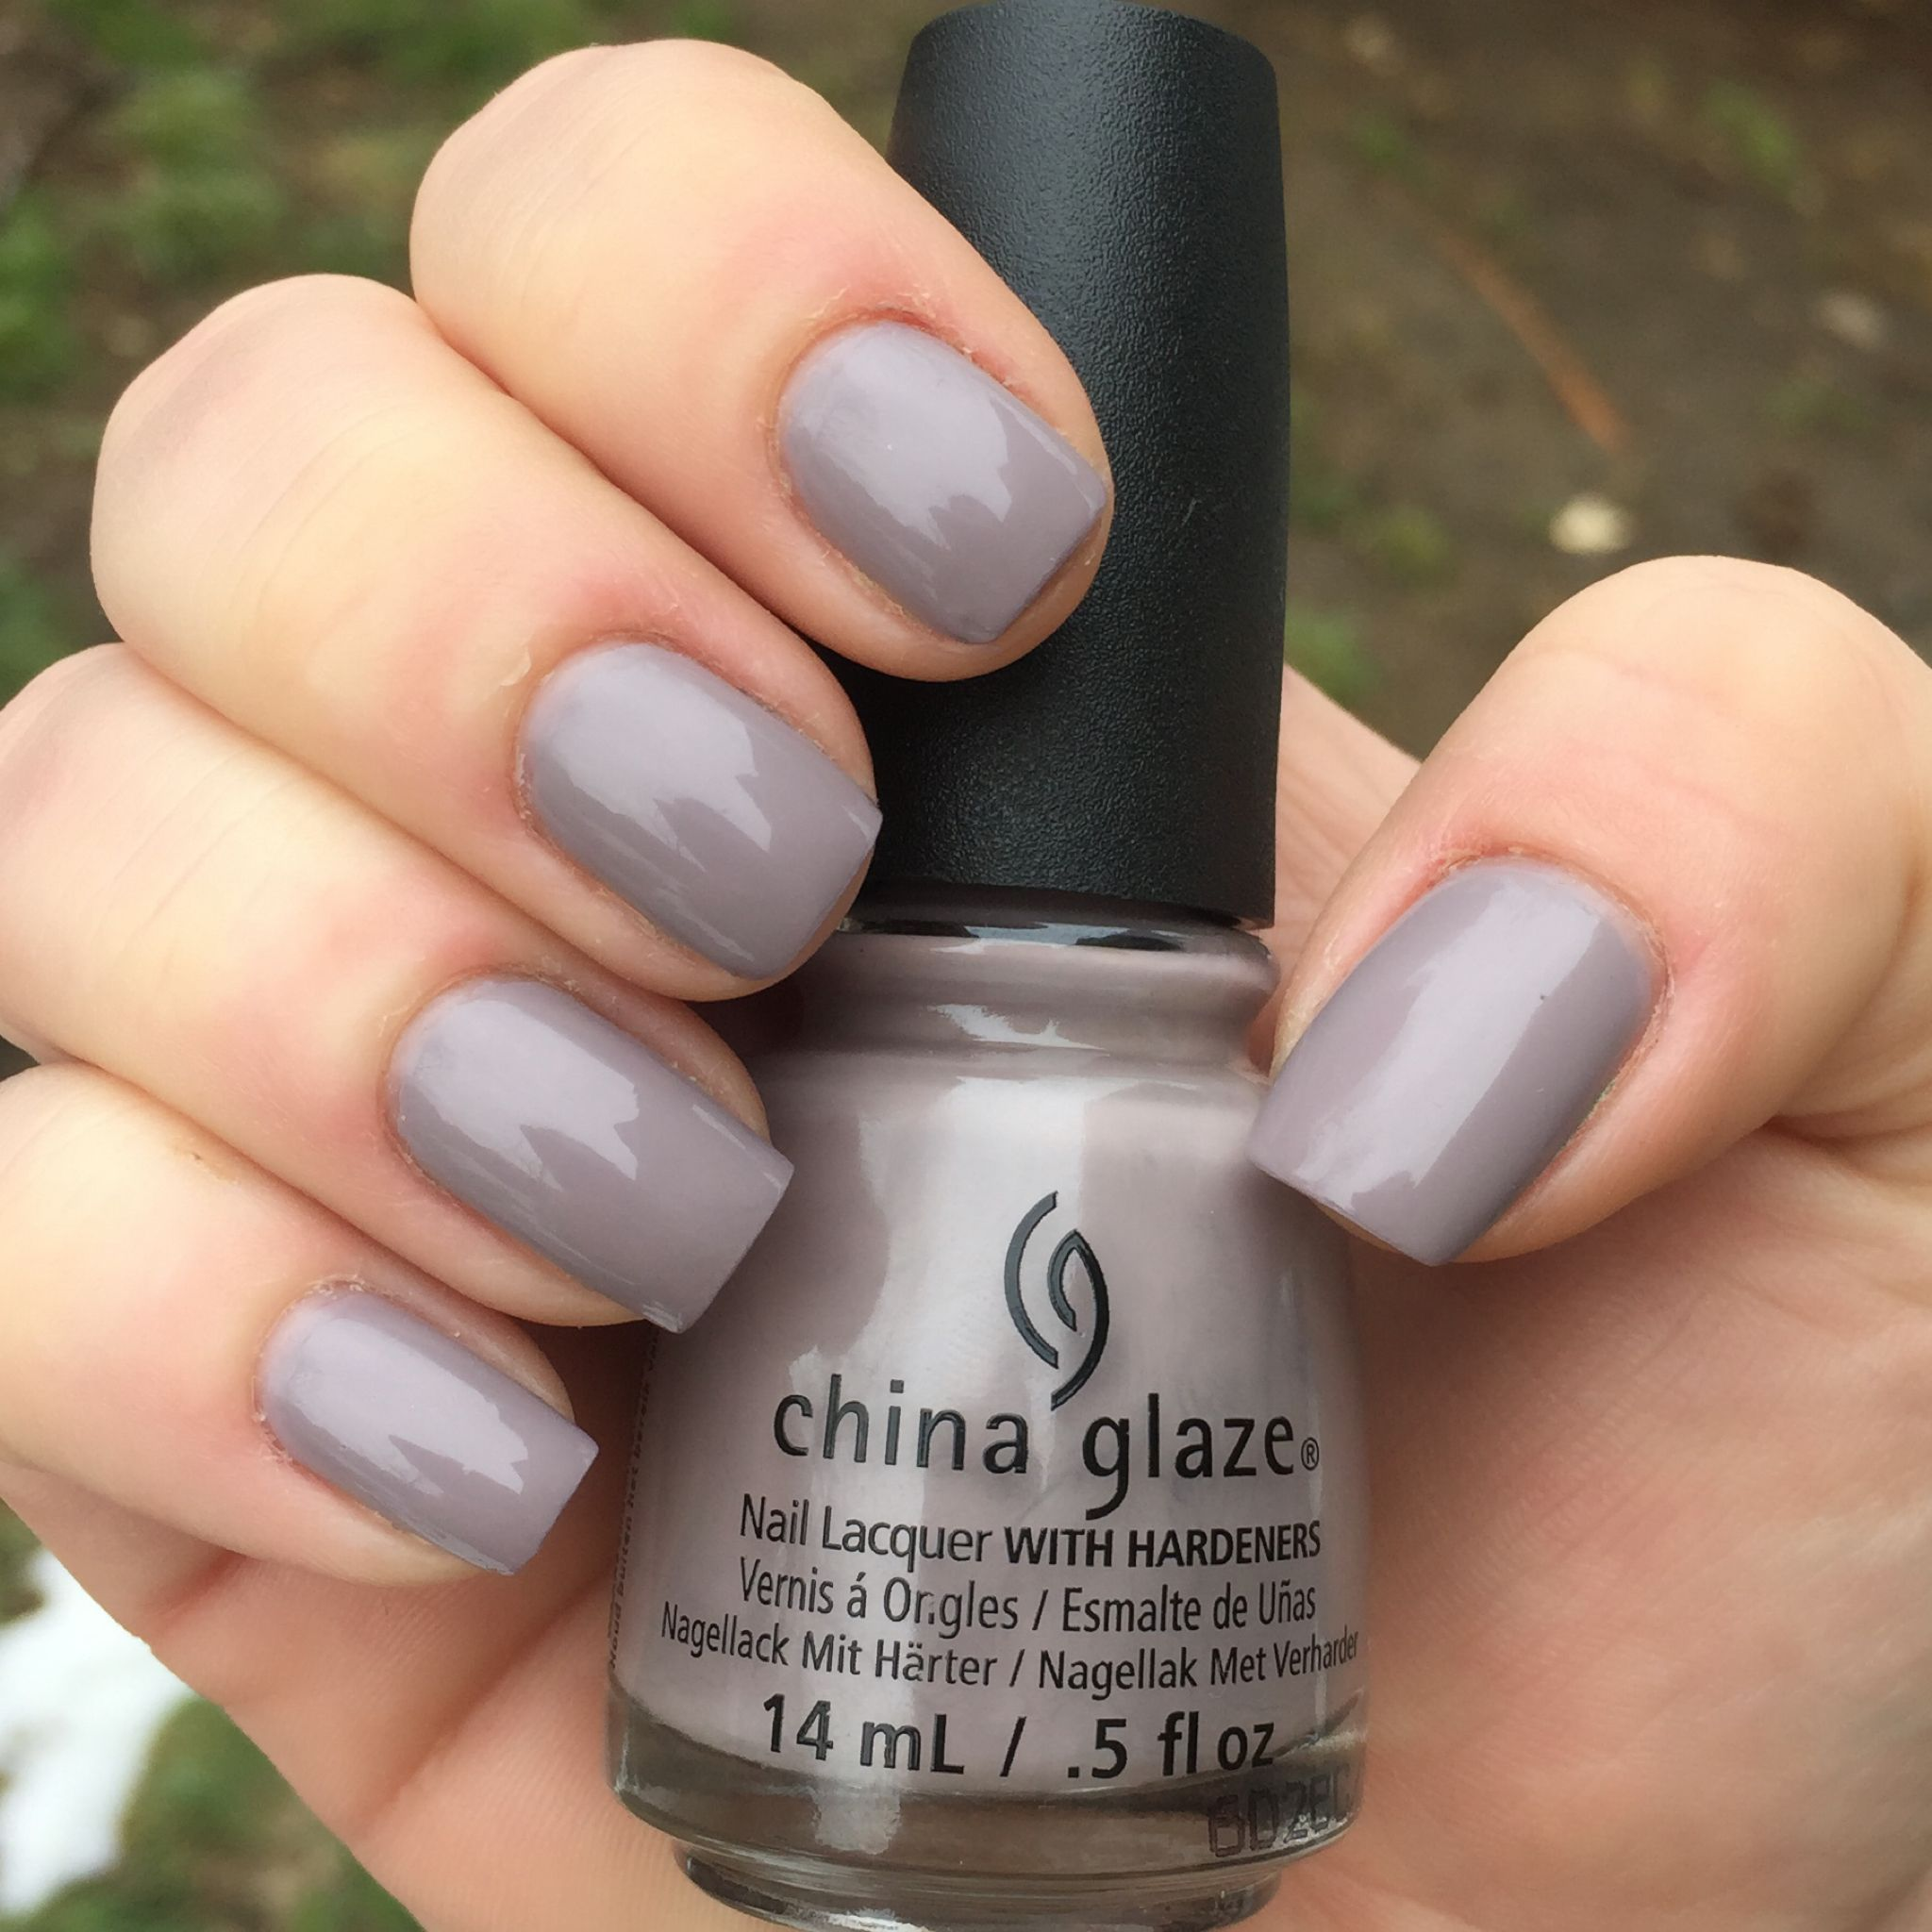 China Glaze: Dope Taupe #Nails #NailSwatch #ChinaGlaze ...